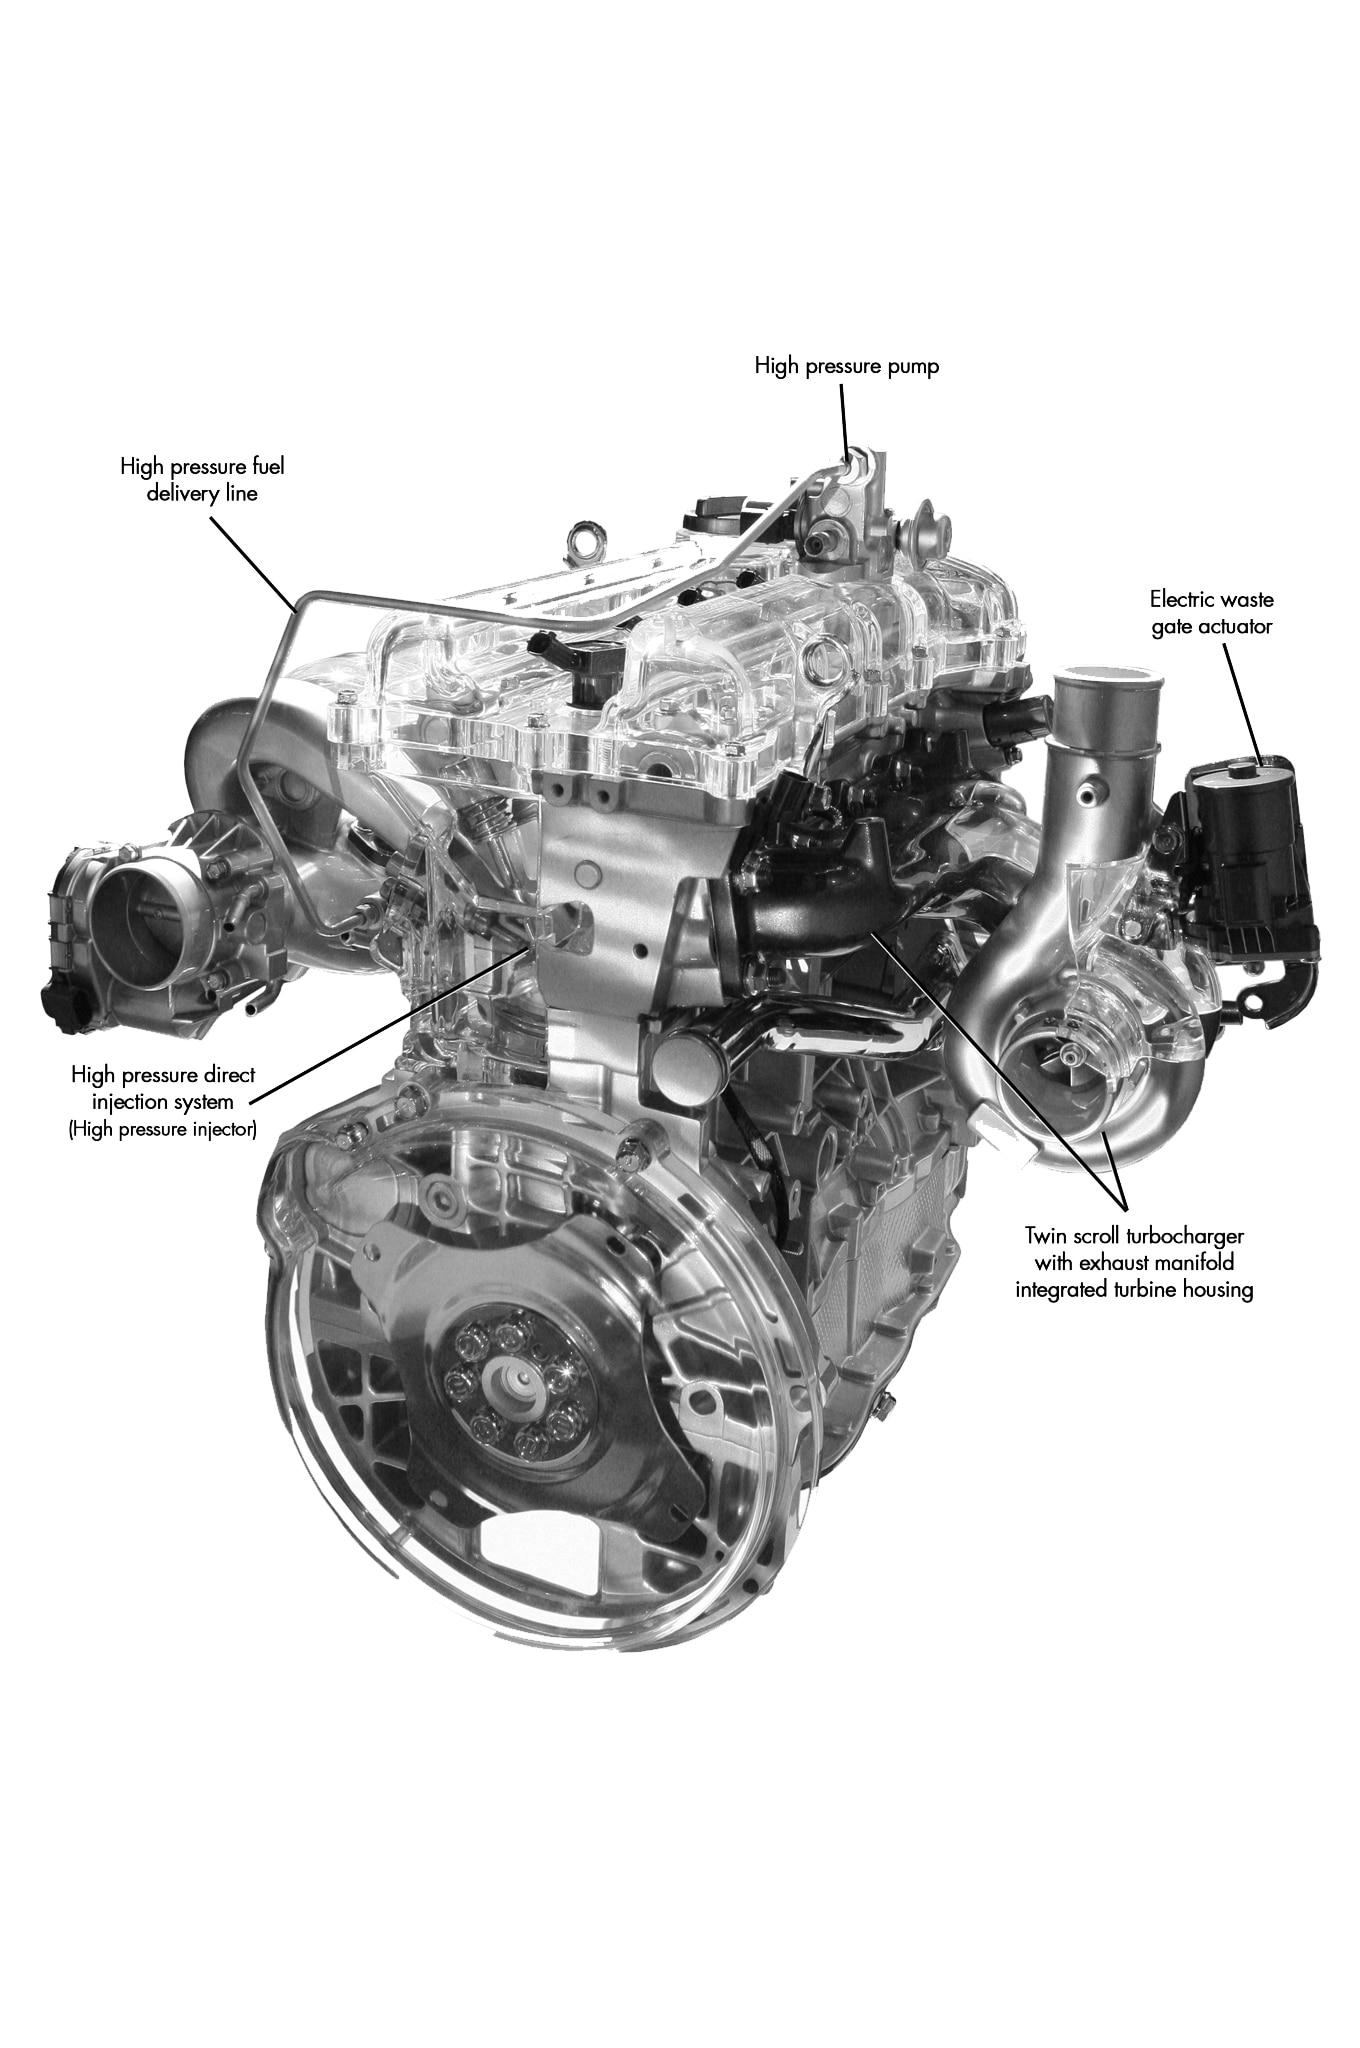 [QMVU_8575]  RE_0193] 2013 Hyundai Sonata Engine Diagram Schematic Wiring | 2013 Hyundai Sonata Engine Diagram |  | Semec Tron Sieg Hapolo Mohammedshrine Librar Wiring 101